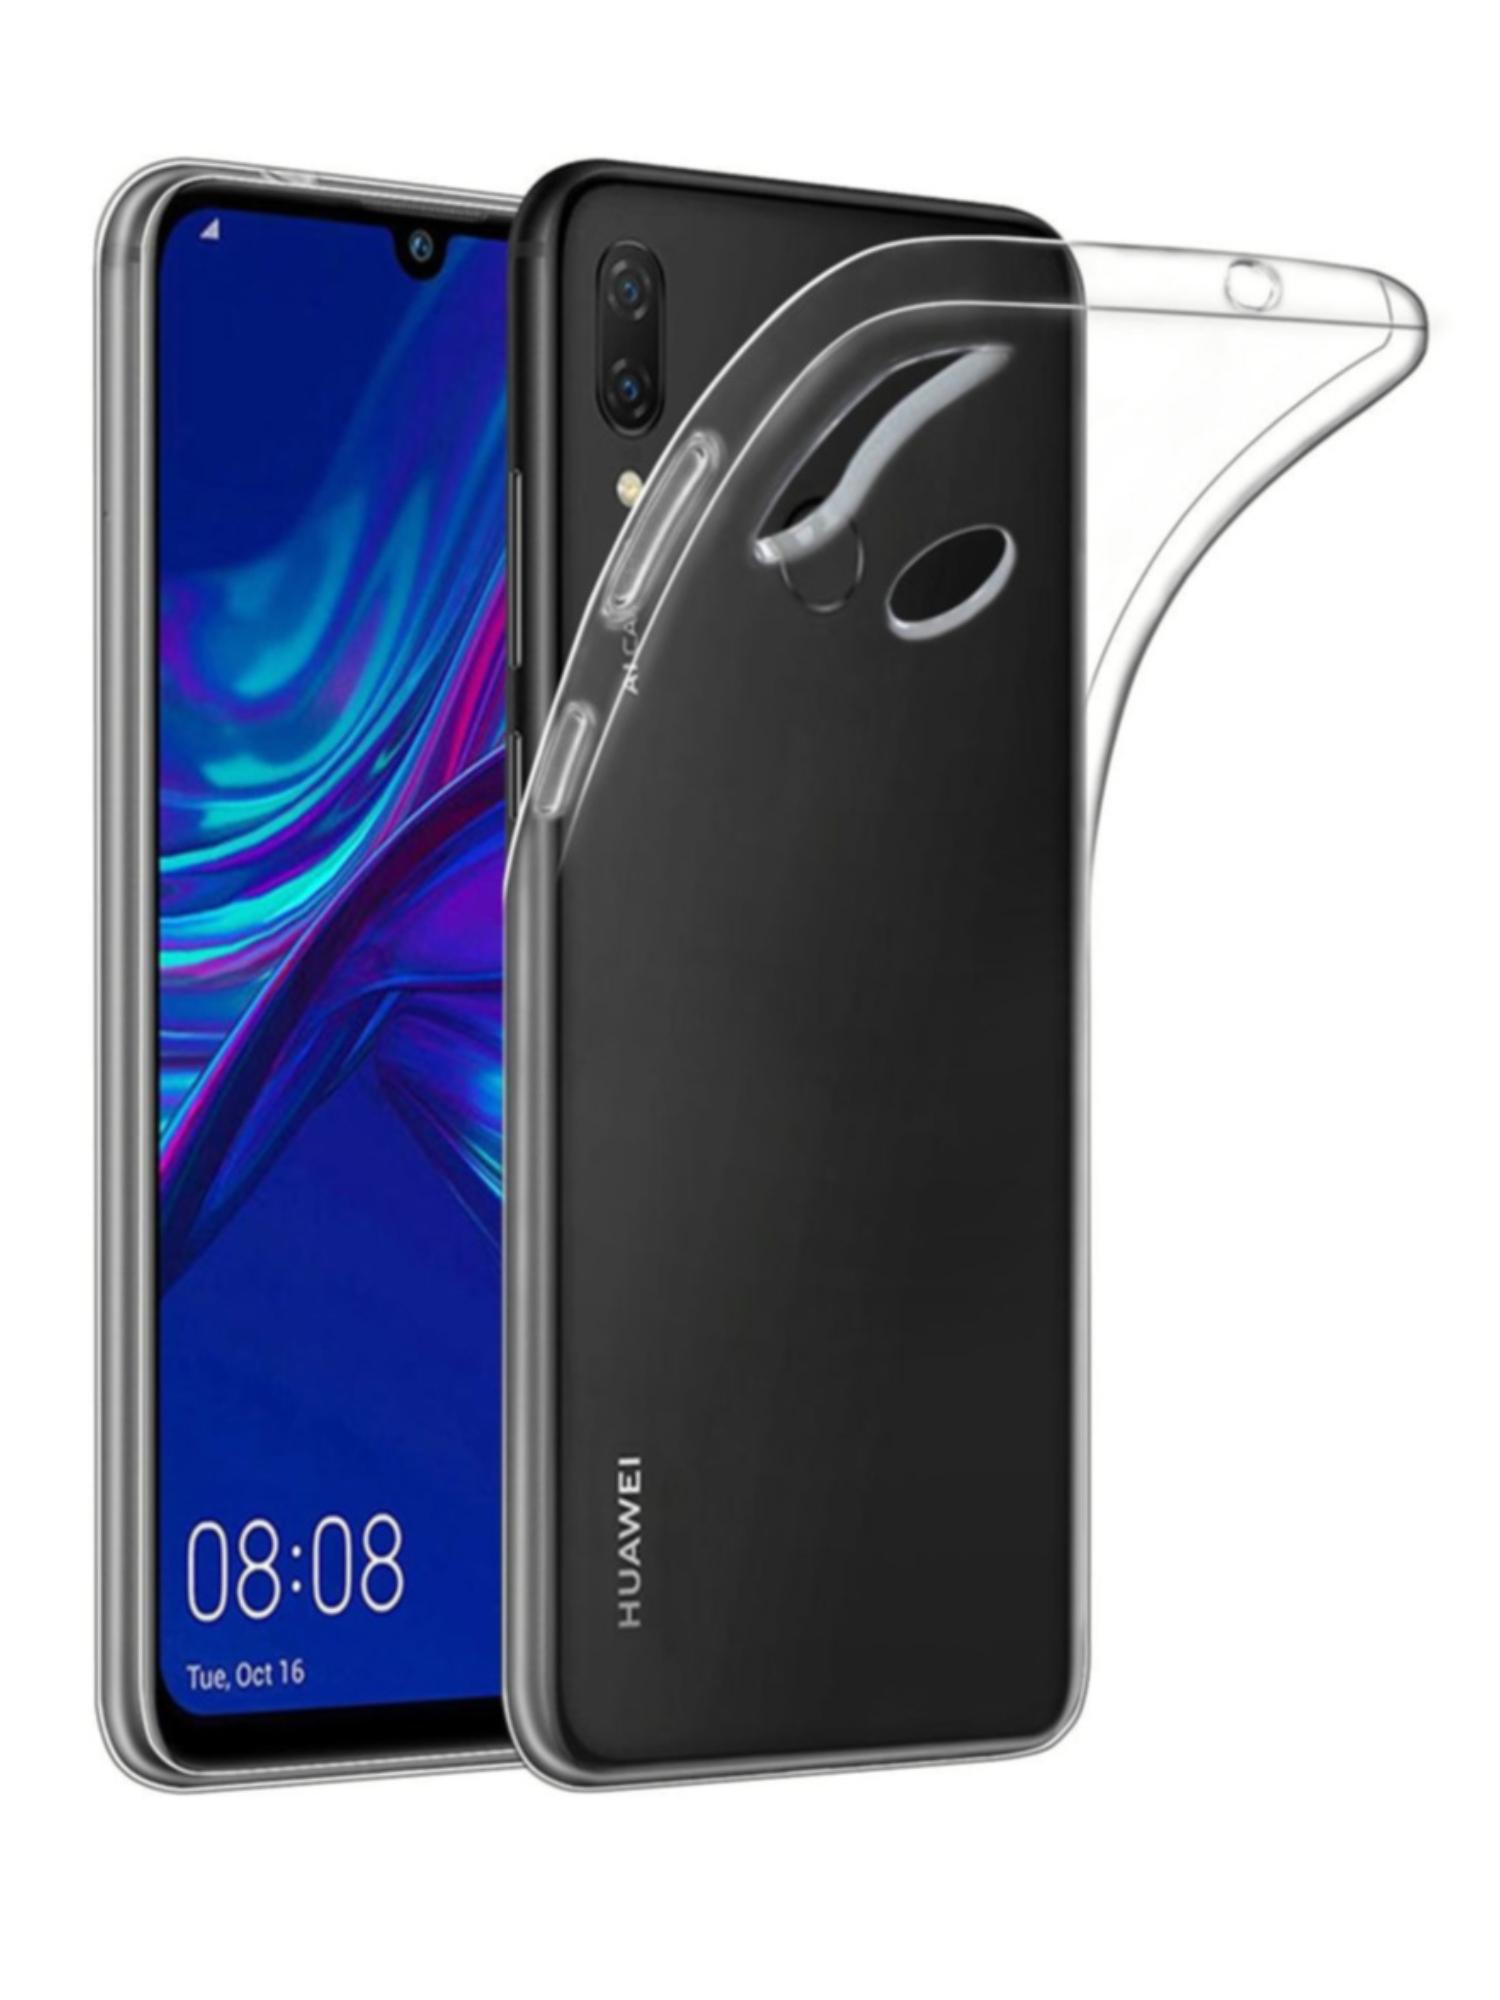 Funda de gel TPU carcasa protectora silicona para movil Huawei P Smart Plus Lite y P Smart 2019 Elige Modelo